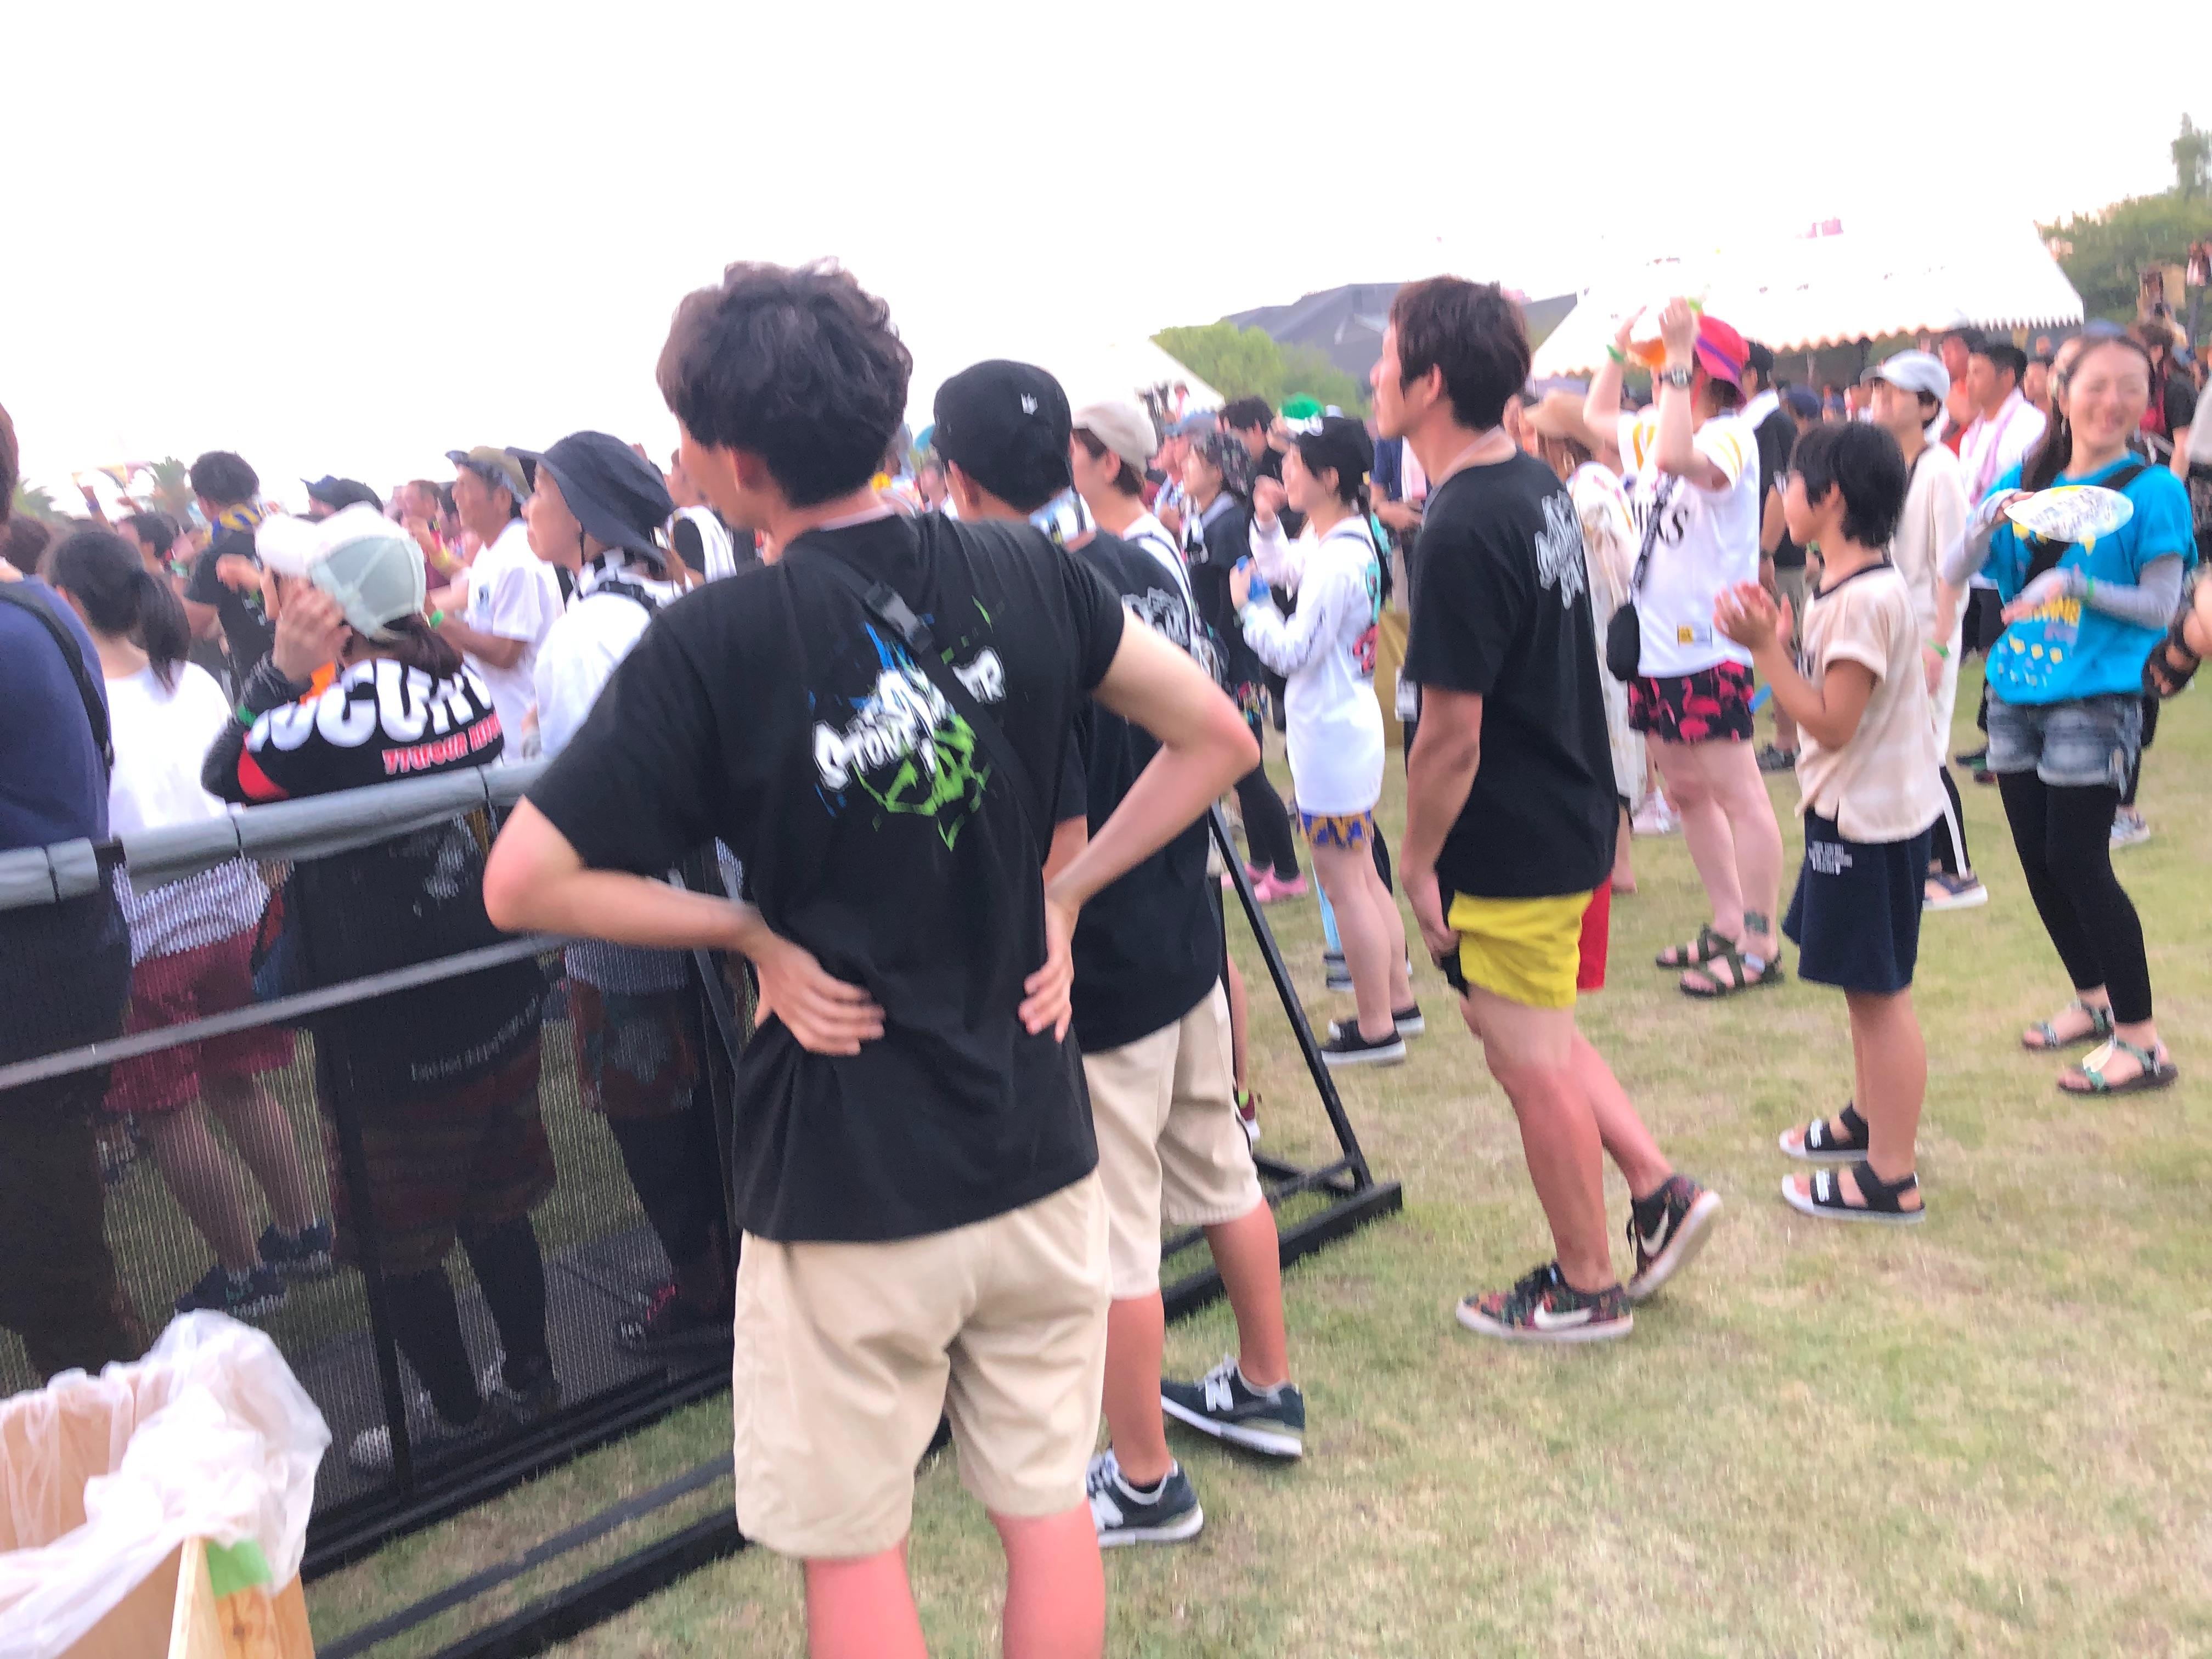 f:id:masanori-kato1972:20190729202903j:image